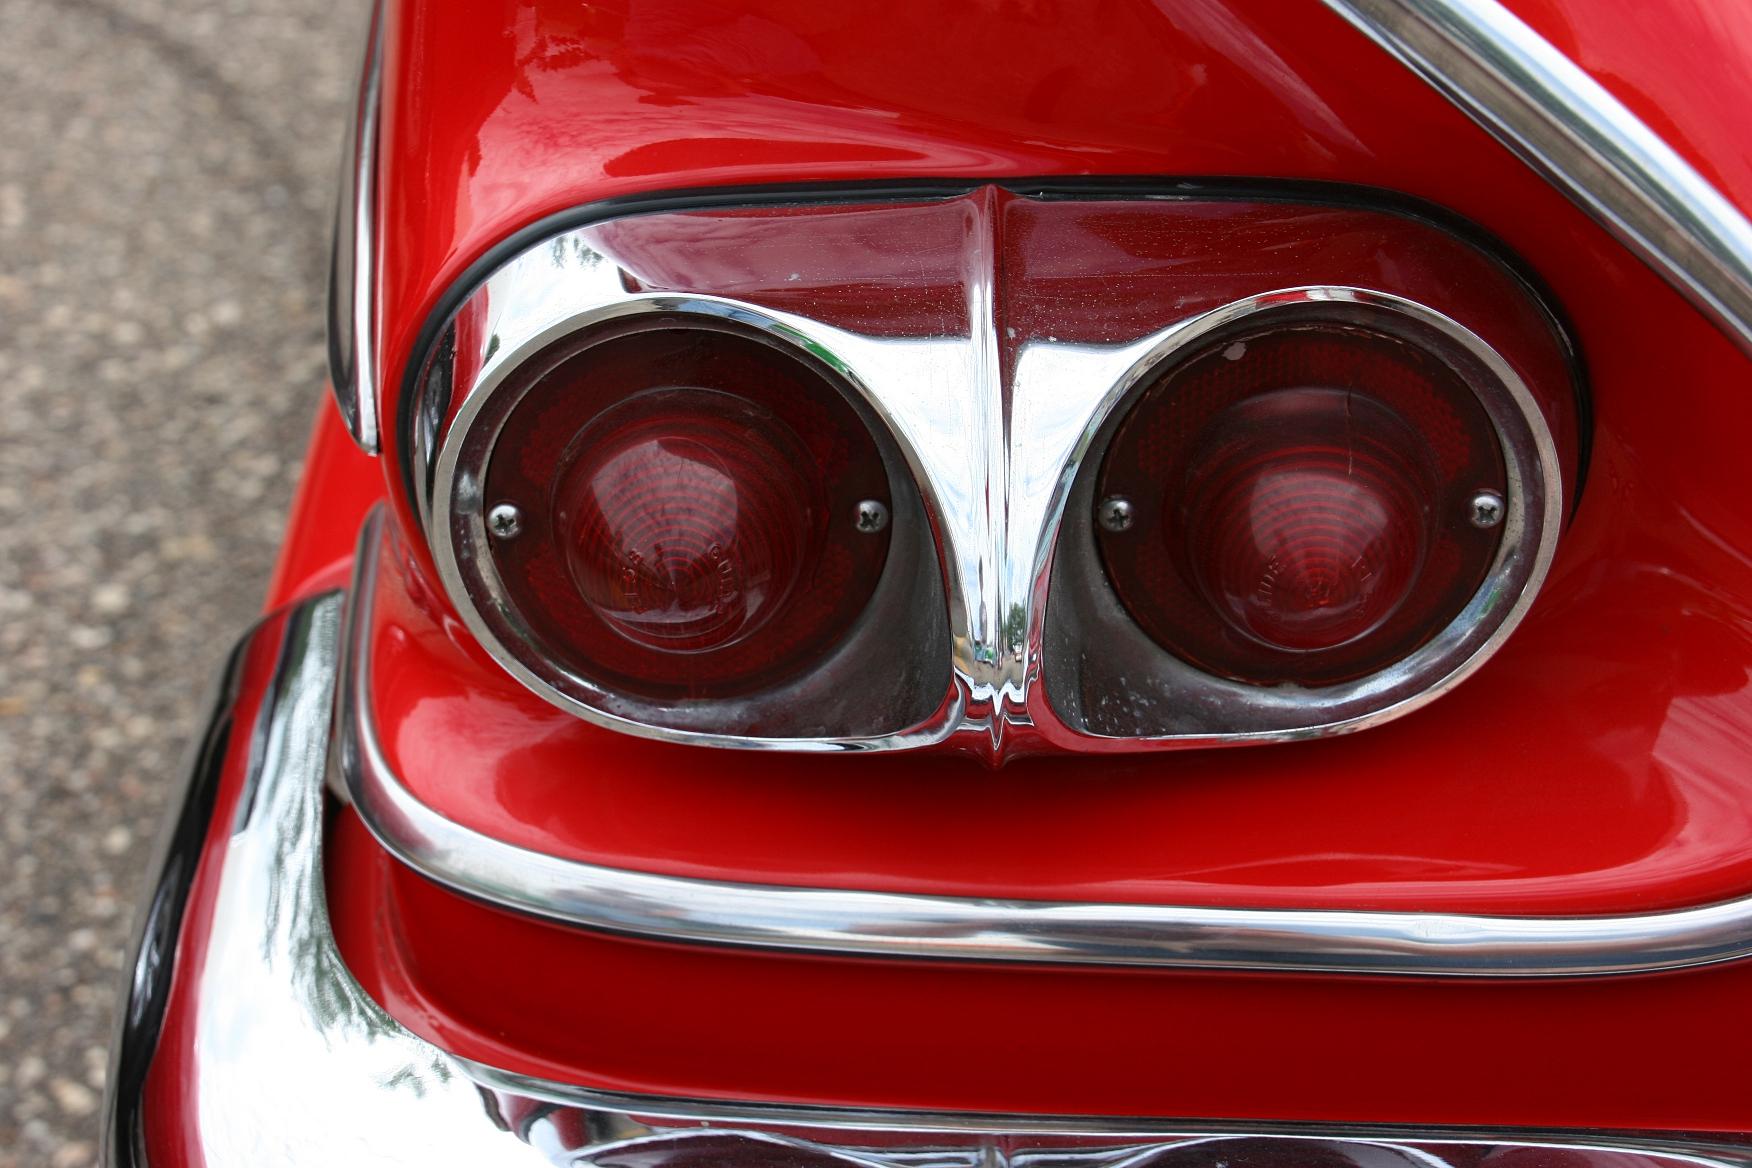 1958 Chevy Tail Light Wiring Diagram Chevrolet Steering Column Cars Minnesota Prairie Roots 1961 Lights